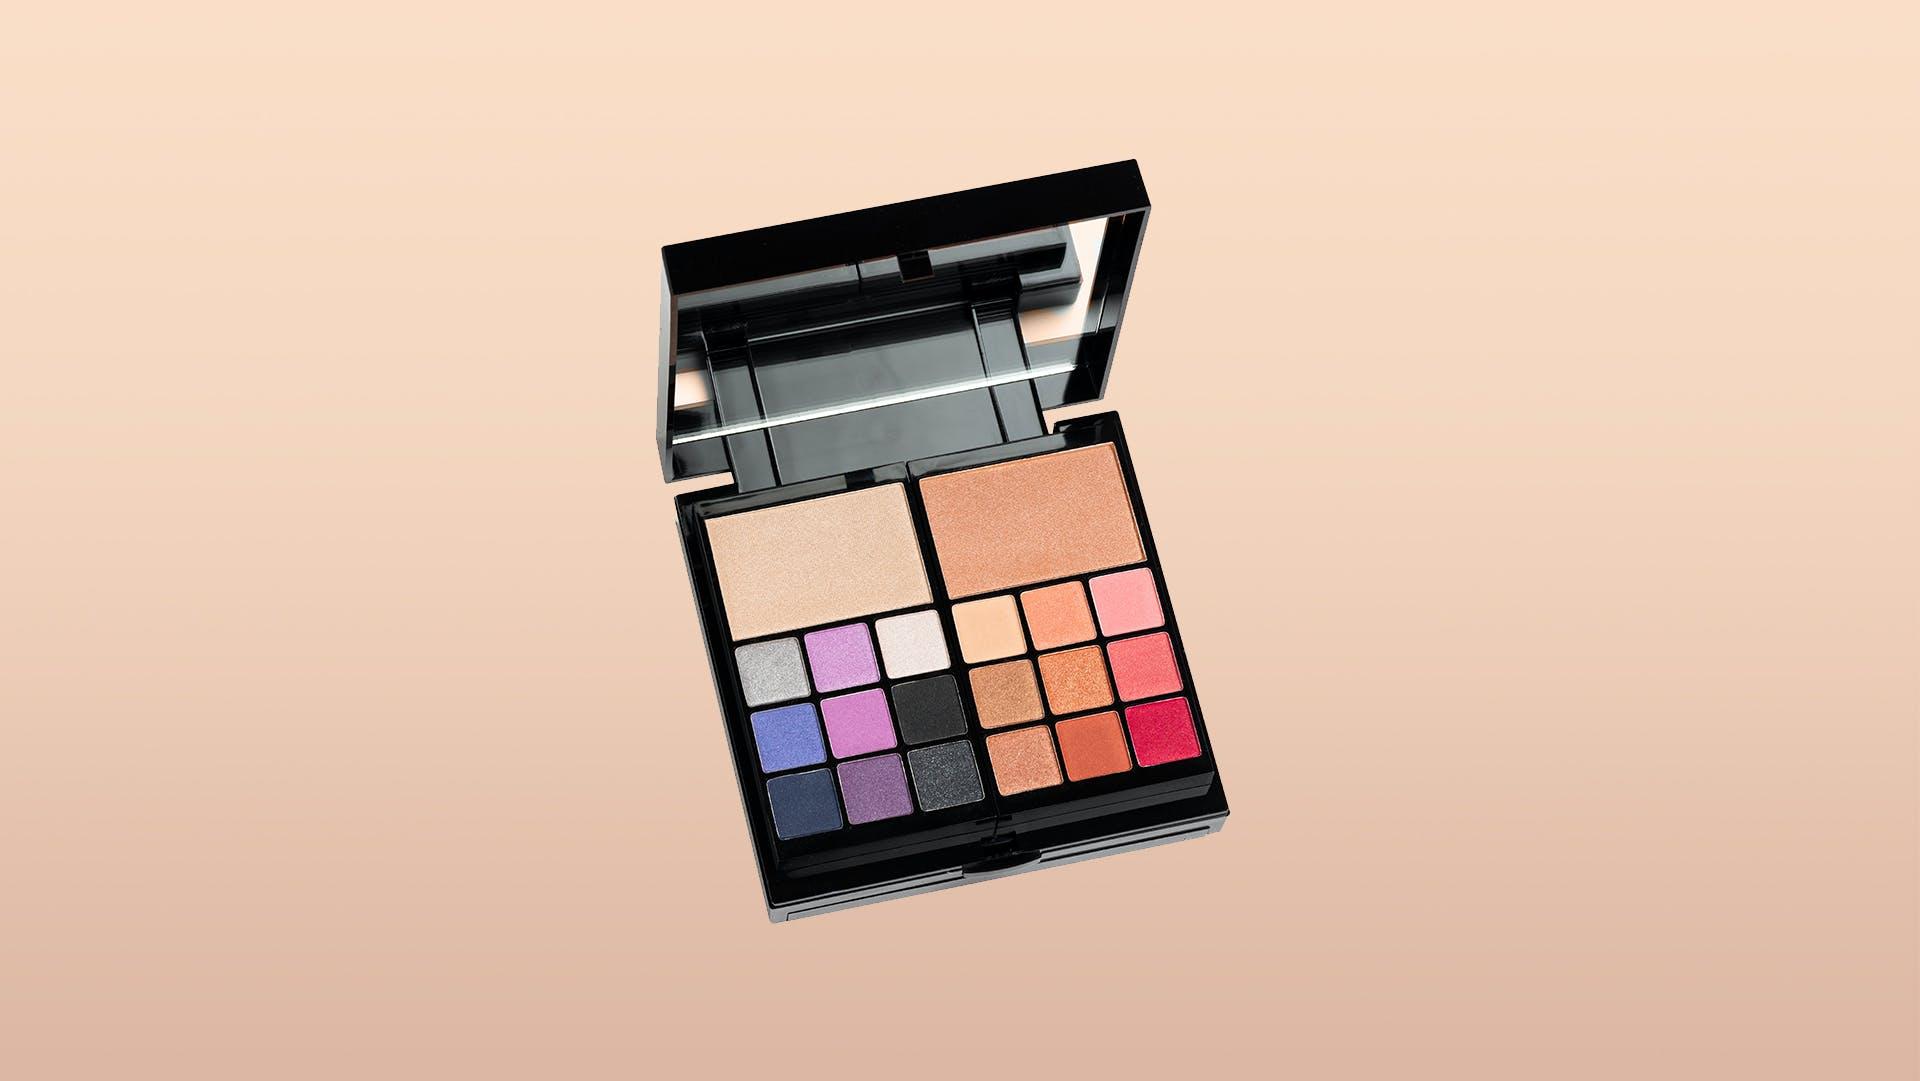 packshot cosmétique, packshot e-commerce, packshot produit, prix packshot, tarif packshot